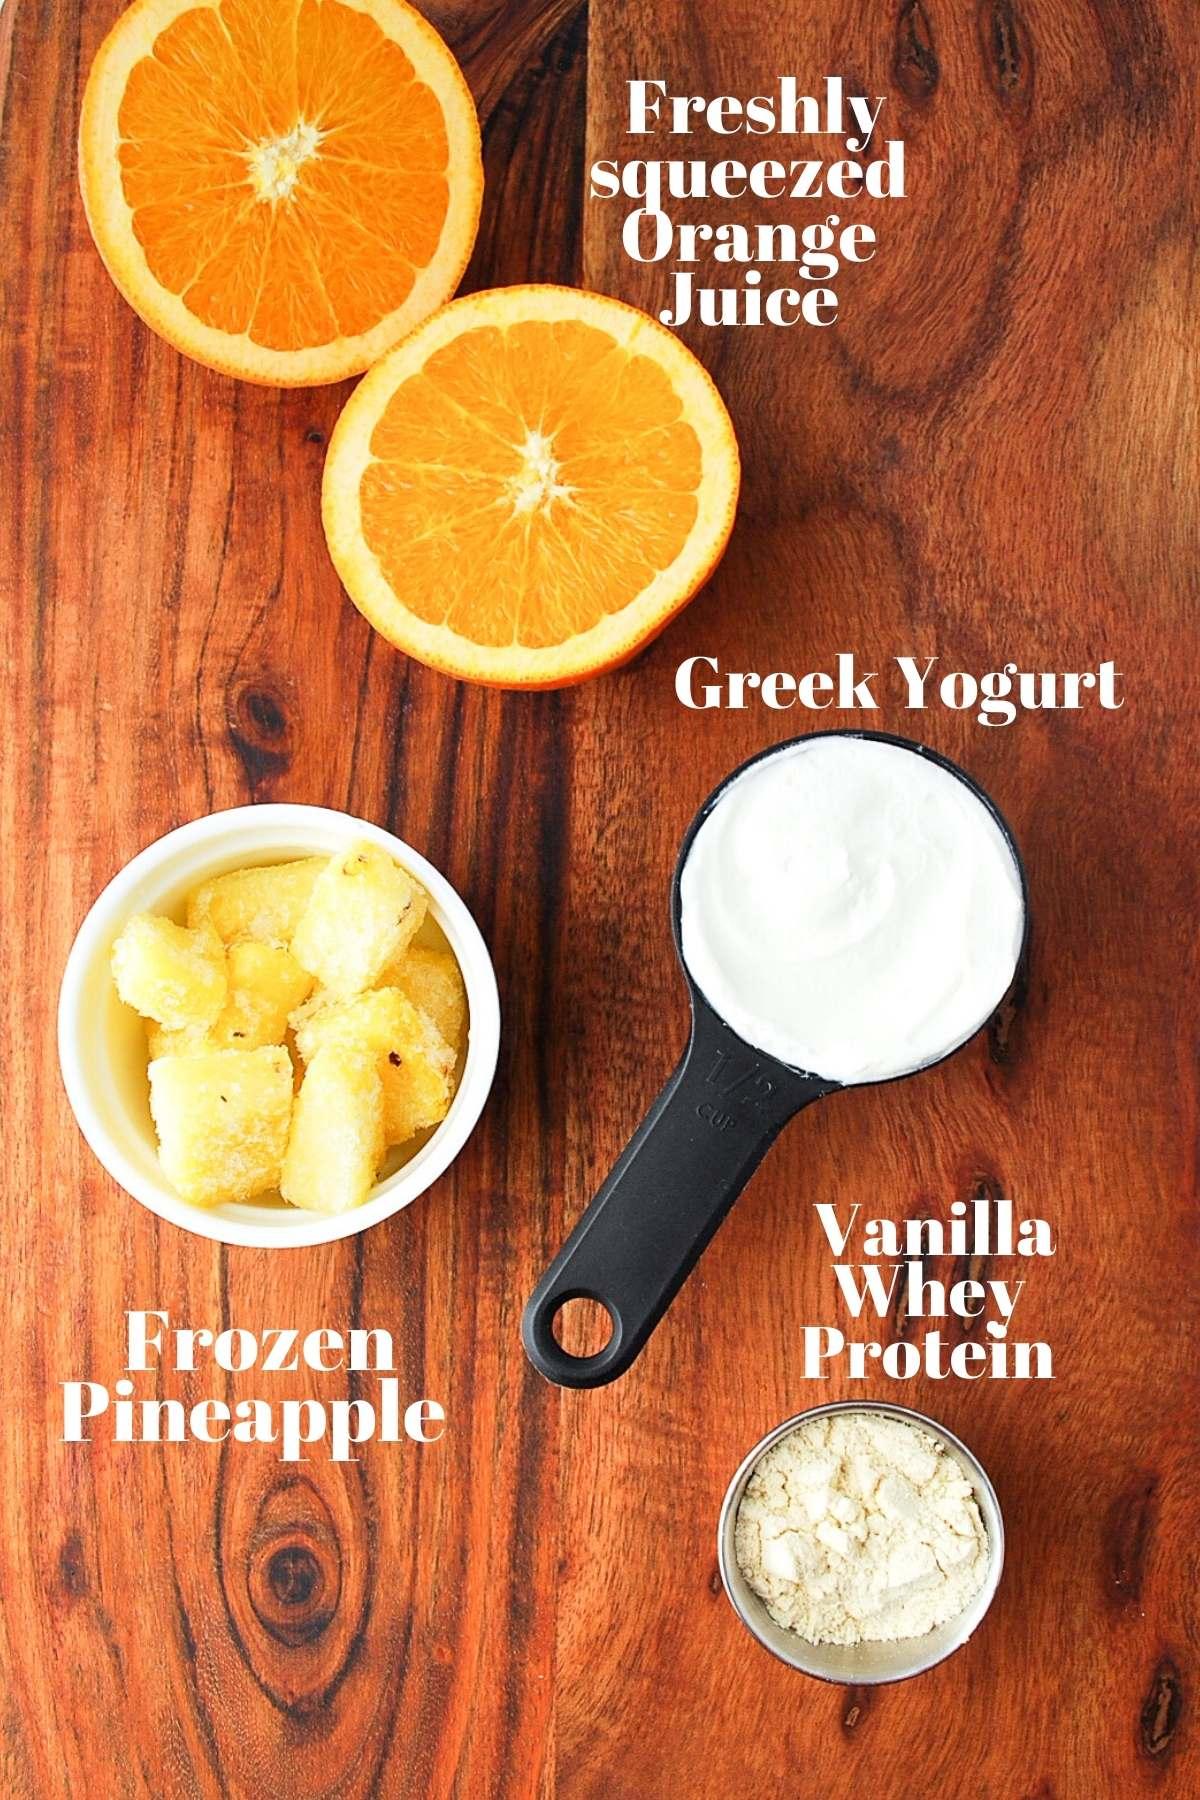 sliced orange, frozen pineapple, greek yogurt, and vanilla protein powder on a board for halloween smoothies